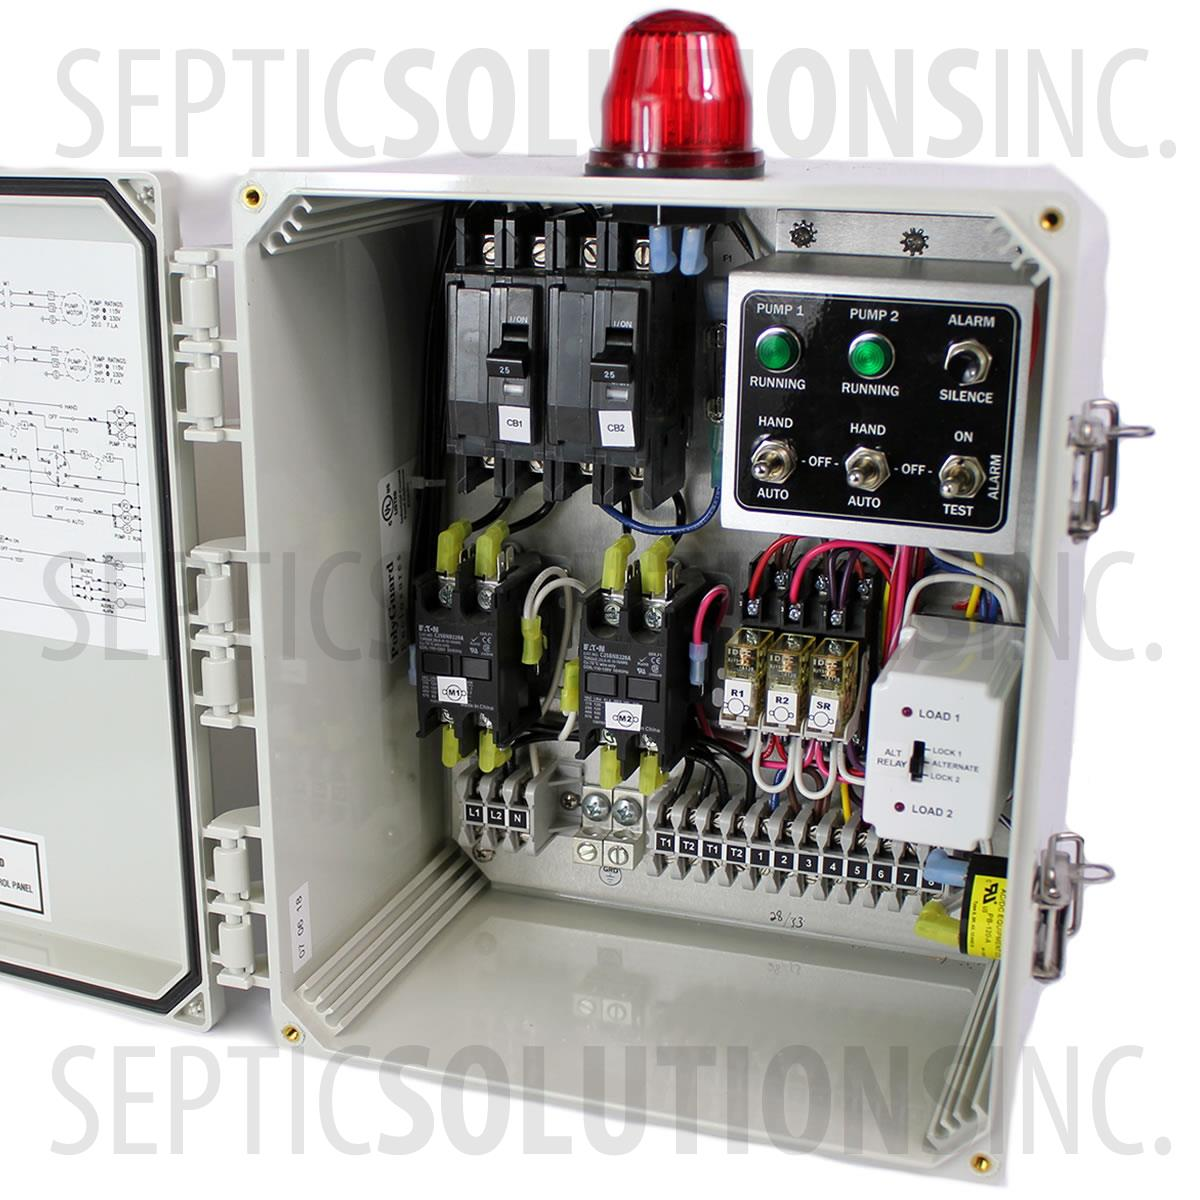 medium resolution of myers duplex pump control panel wiring diagram 1 wiring diagram duplex sewage pump control panels free